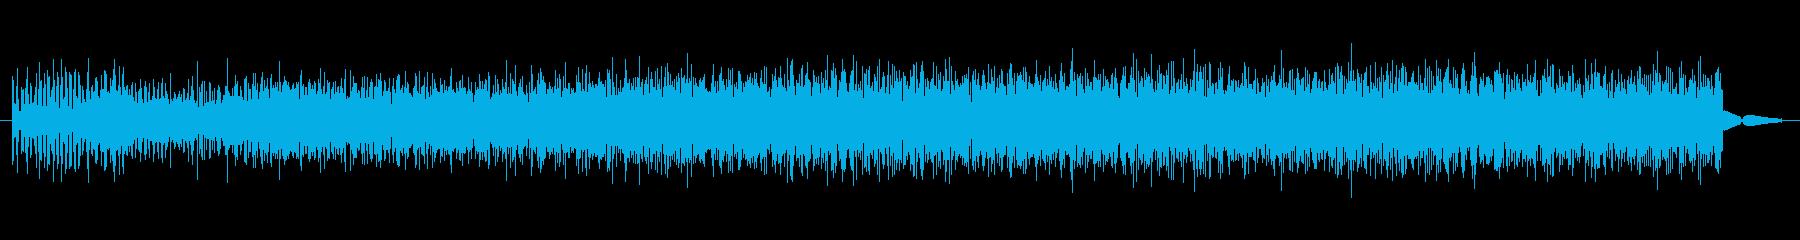 RADIO CONTROL FRE...の再生済みの波形